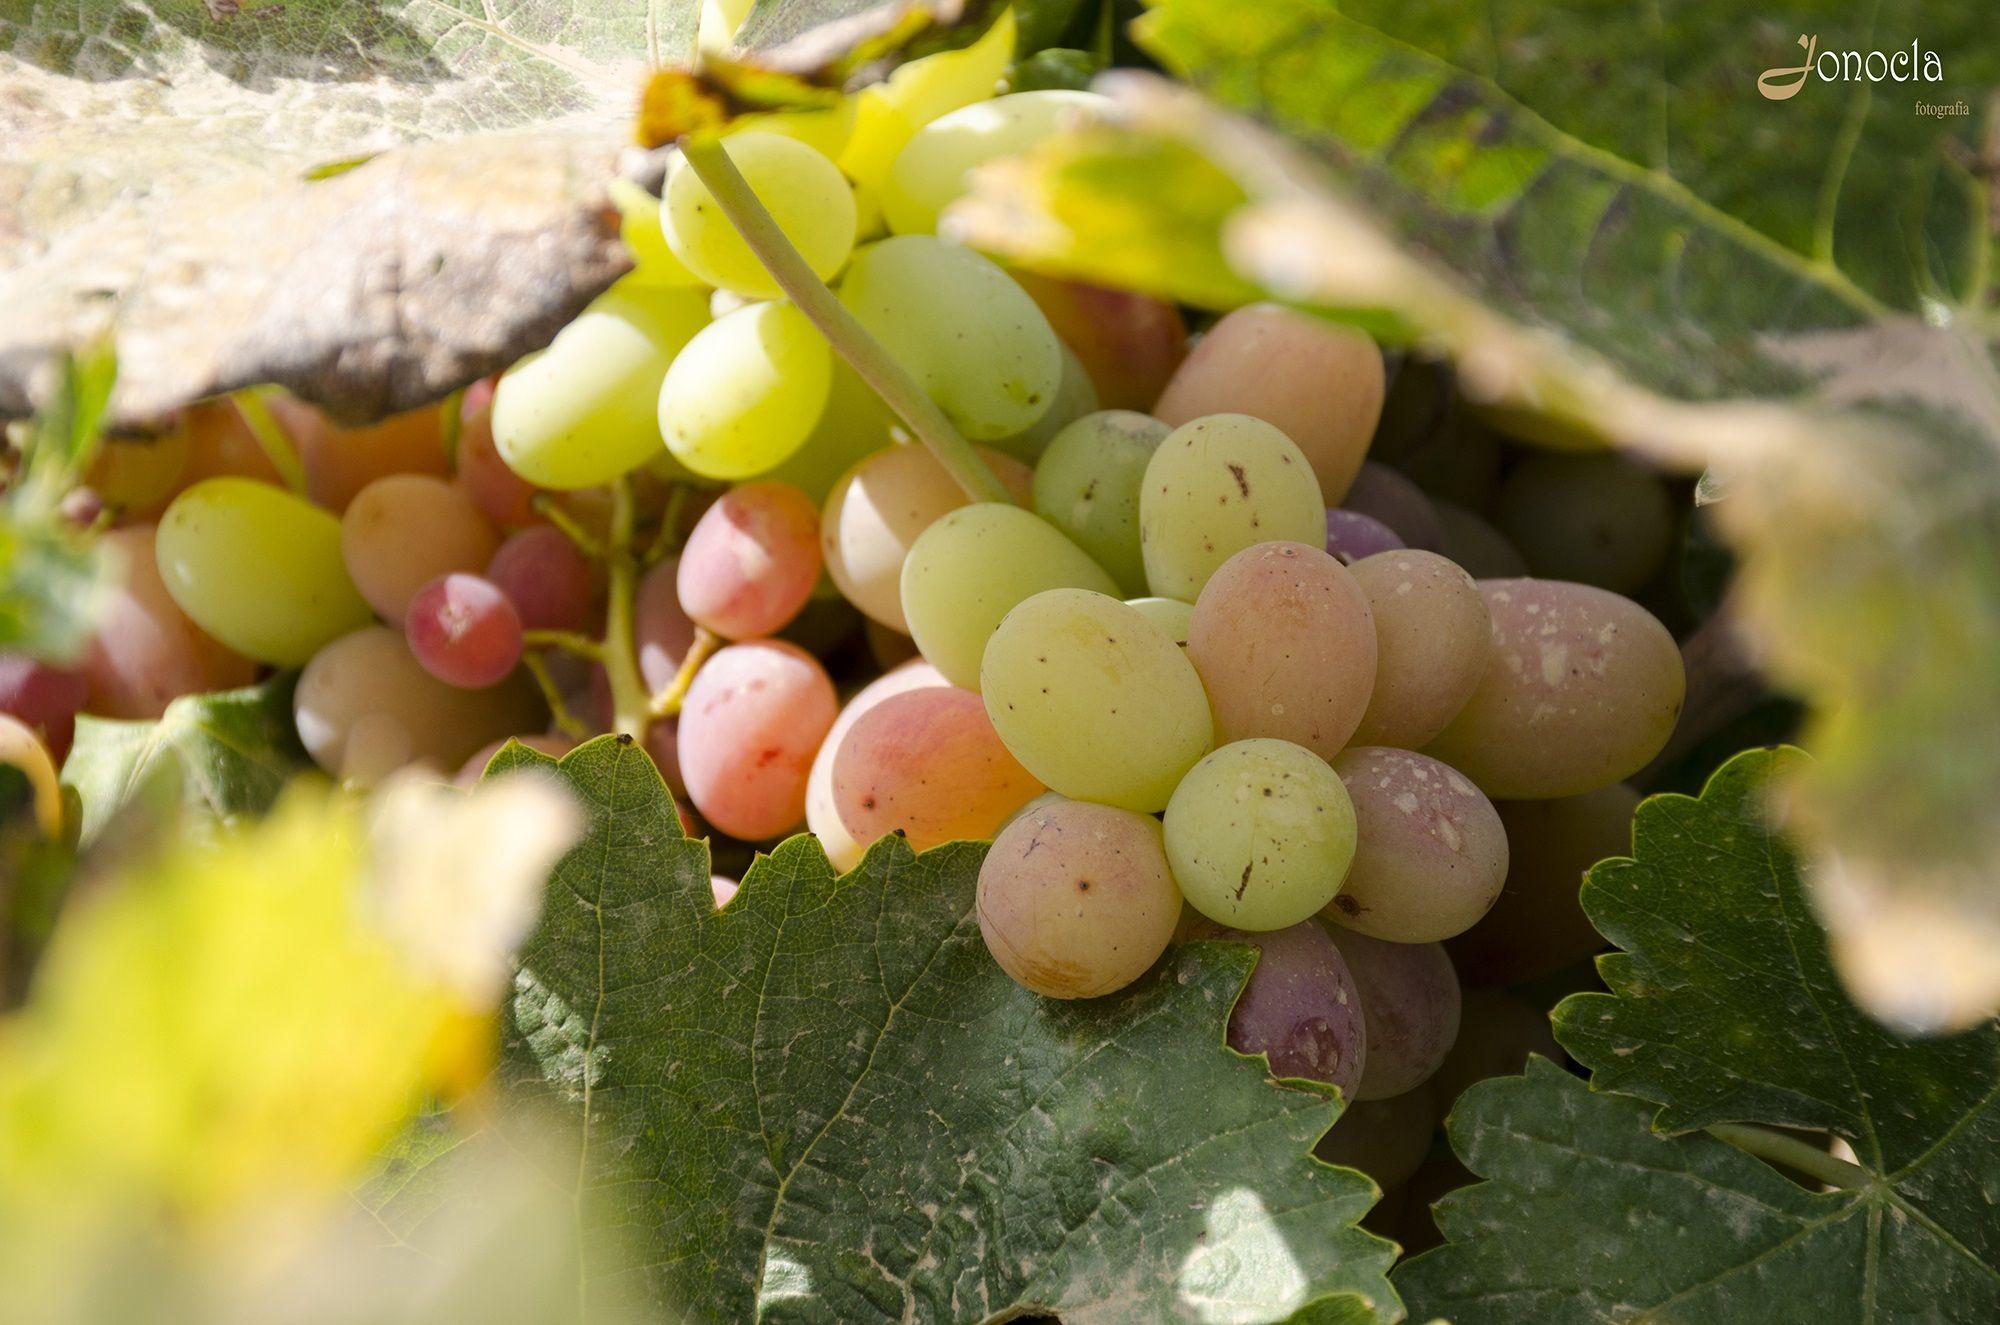 jonocla uvas 3